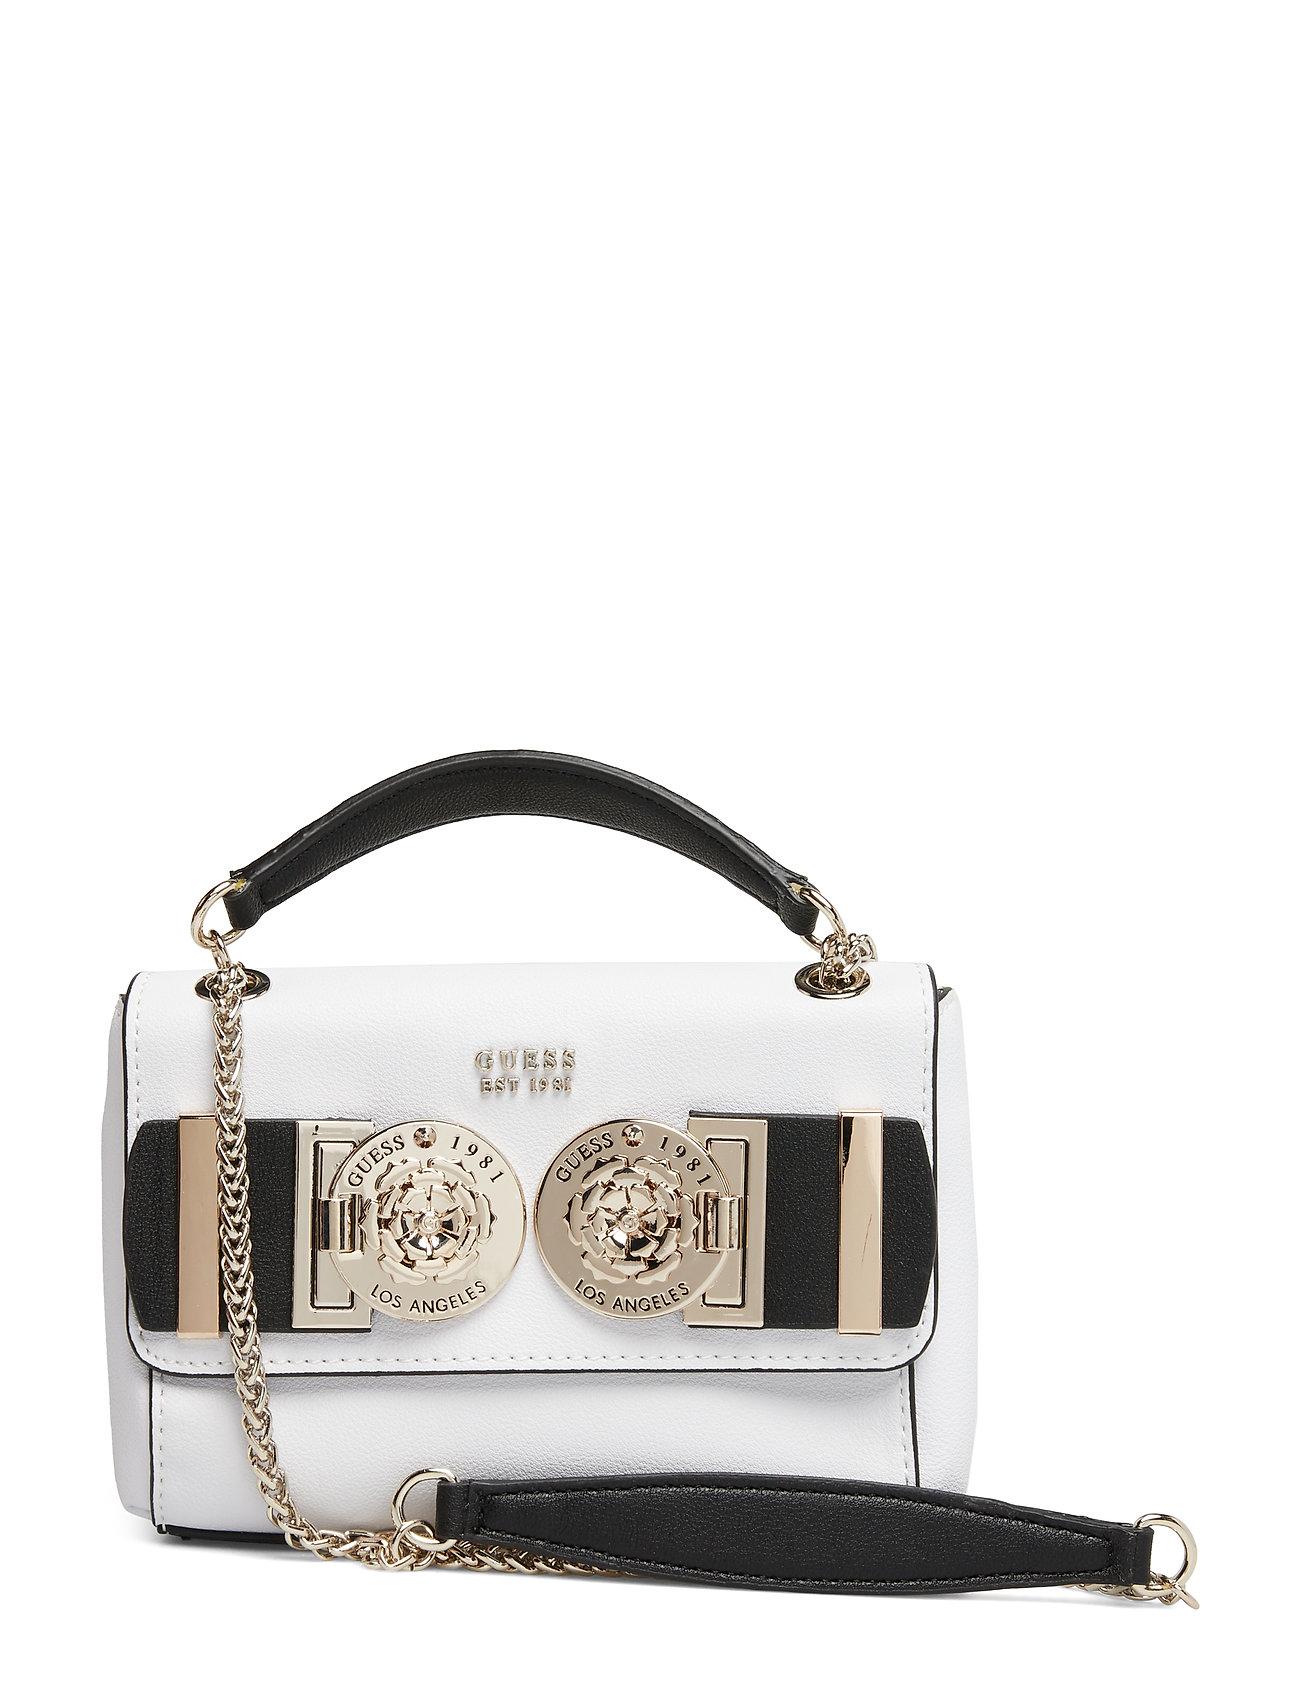 GUESS Carina Mini Convtbl Crsbdy Flp Bags Card Holders & Wallets Wallets Weiß GUESS